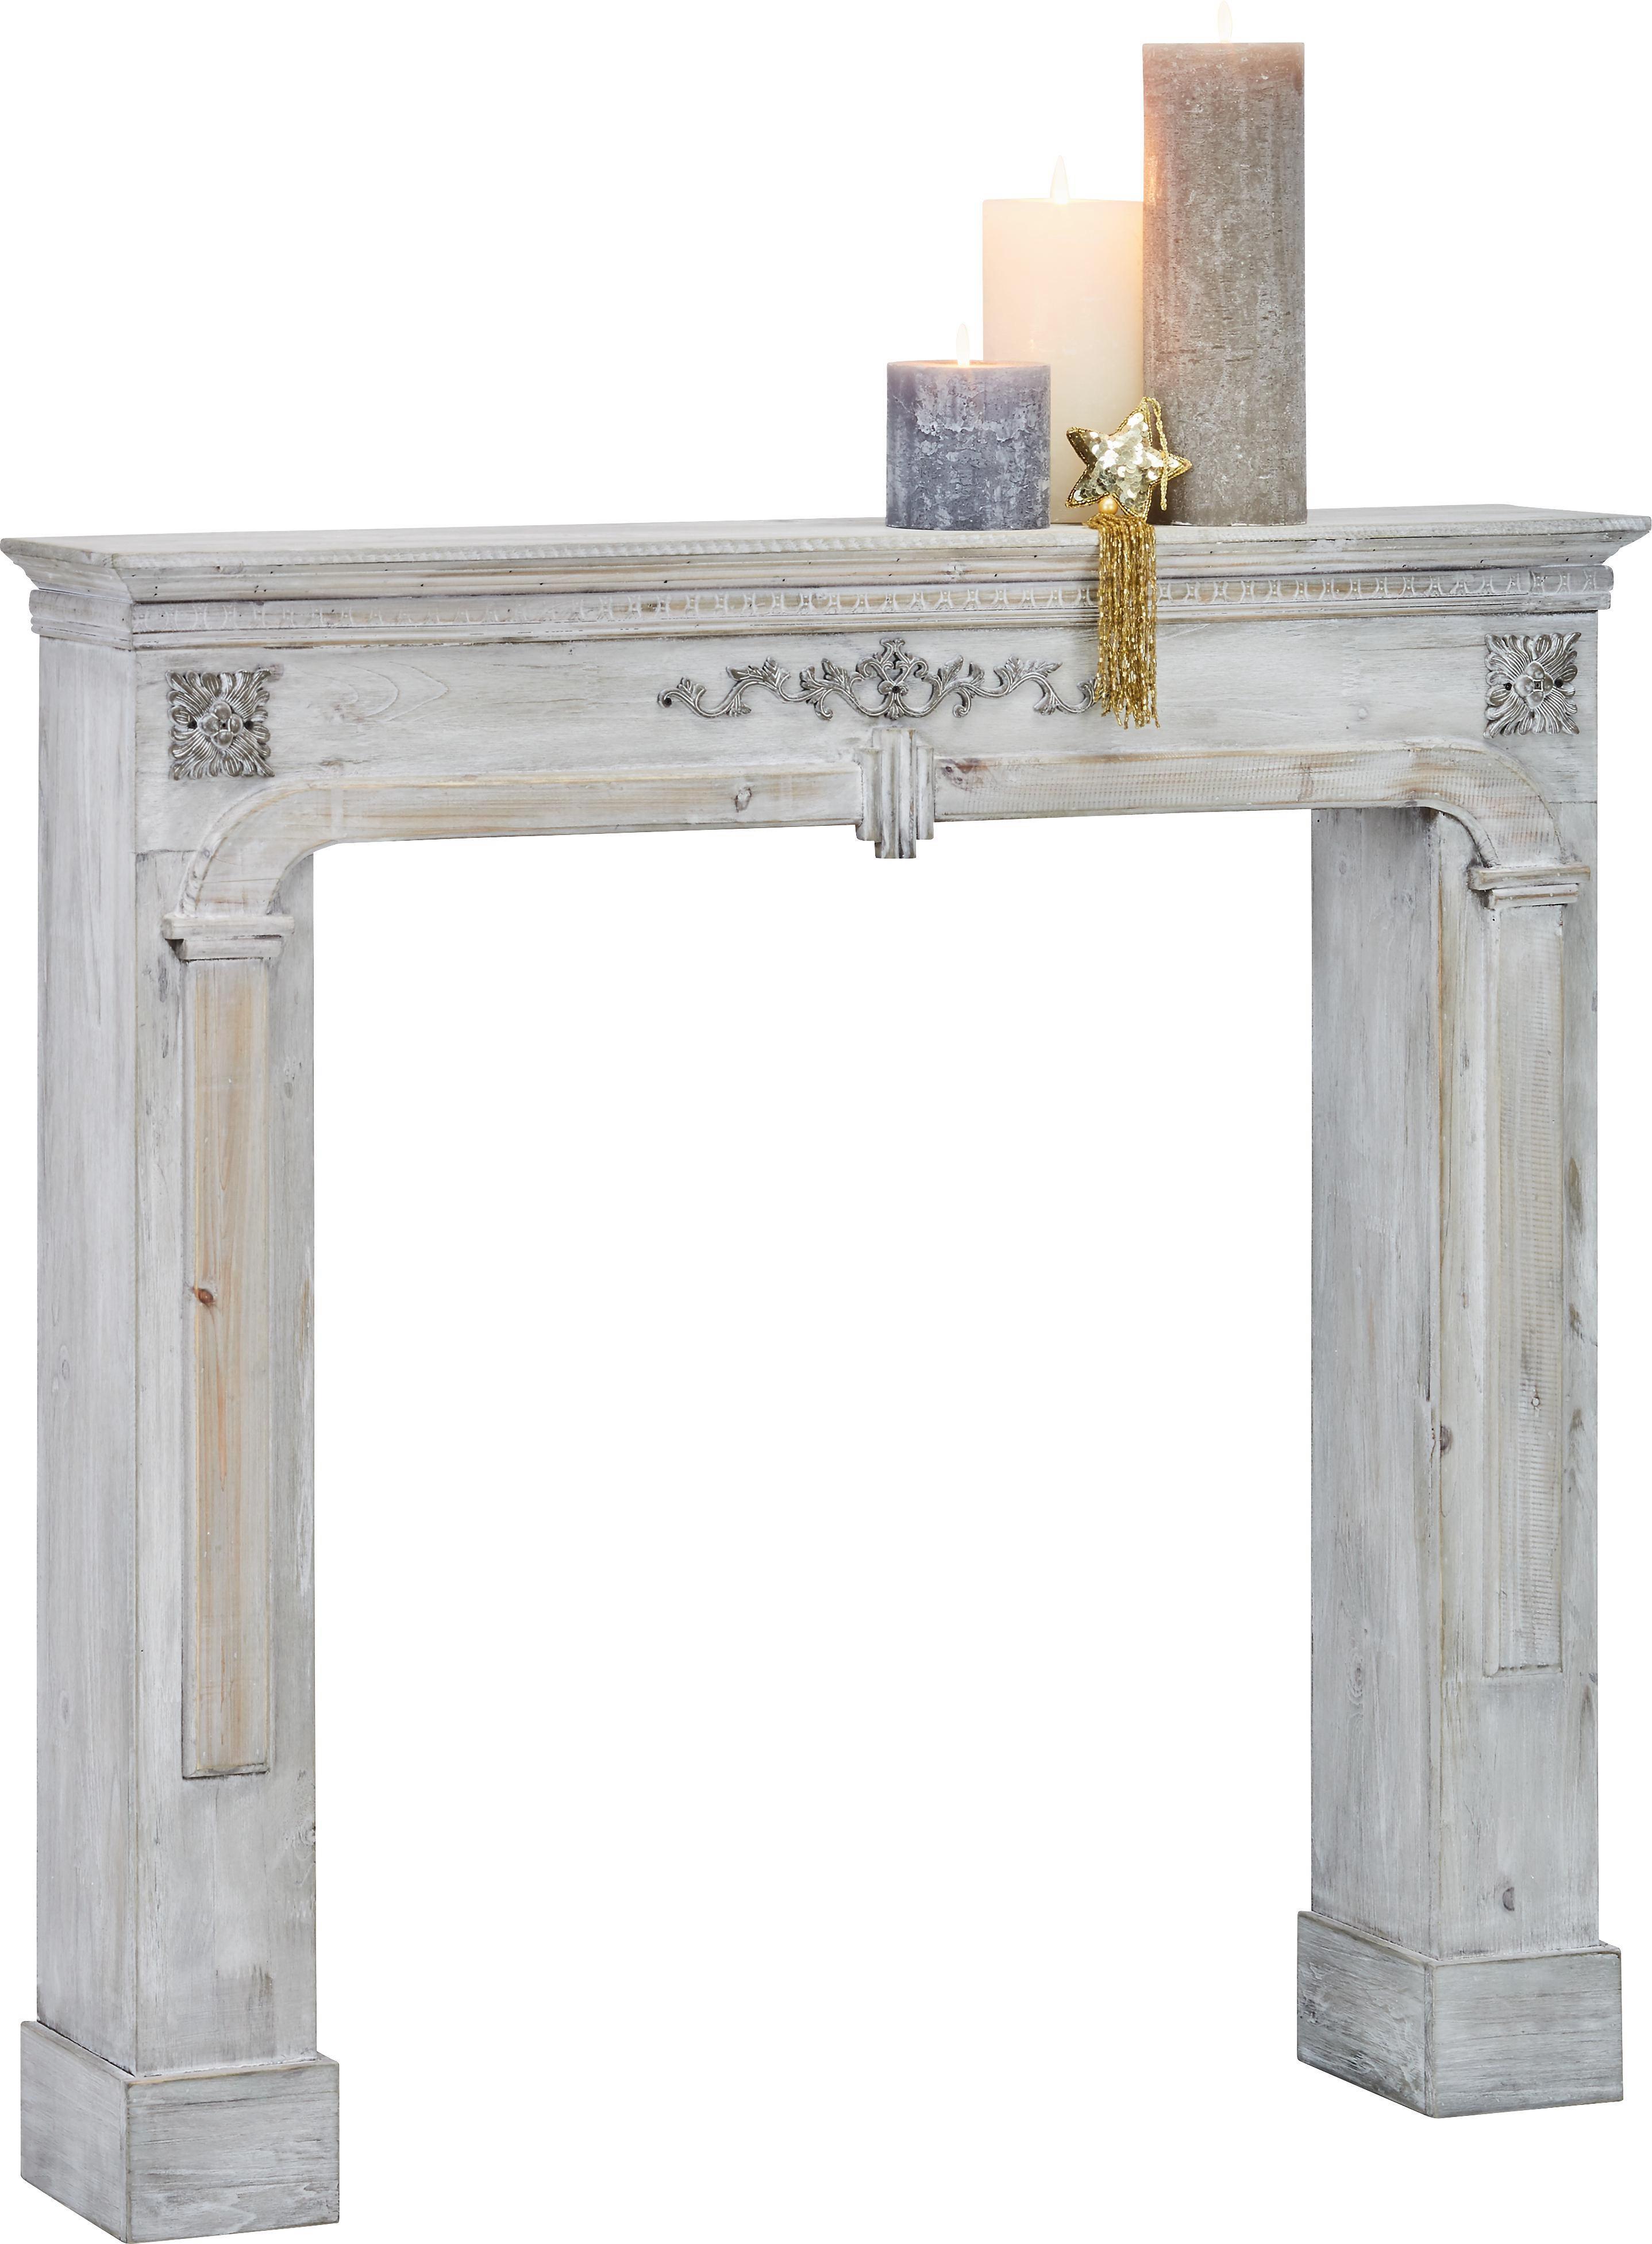 Kaminumrandung In Vintage Weiß - Weiß, LIFESTYLE, Holz/Holzwerkstoff (104/99,35/17cm) - MÖMAX modern living